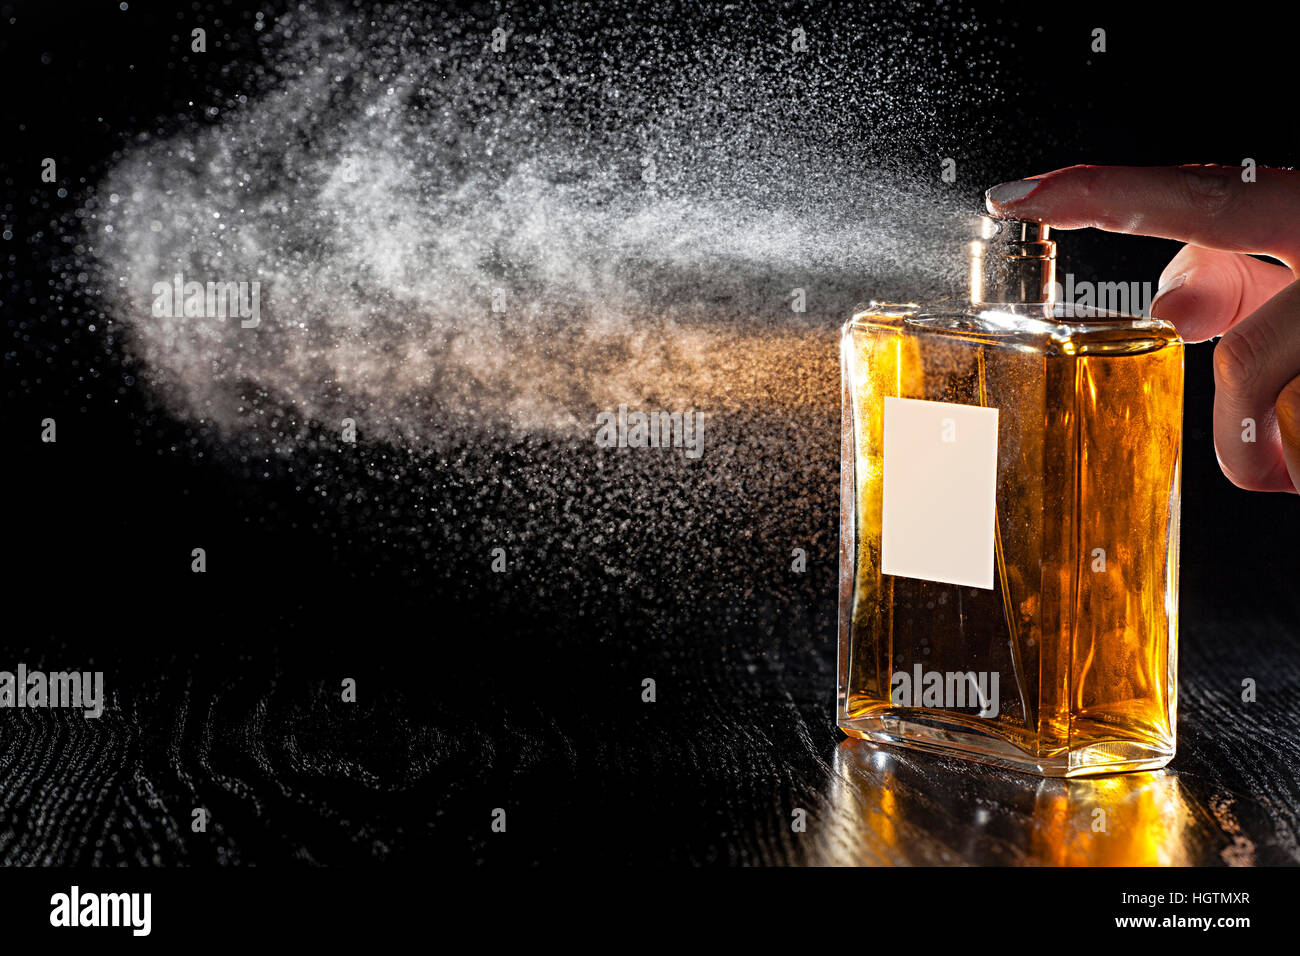 perfume with black background - Stock Image